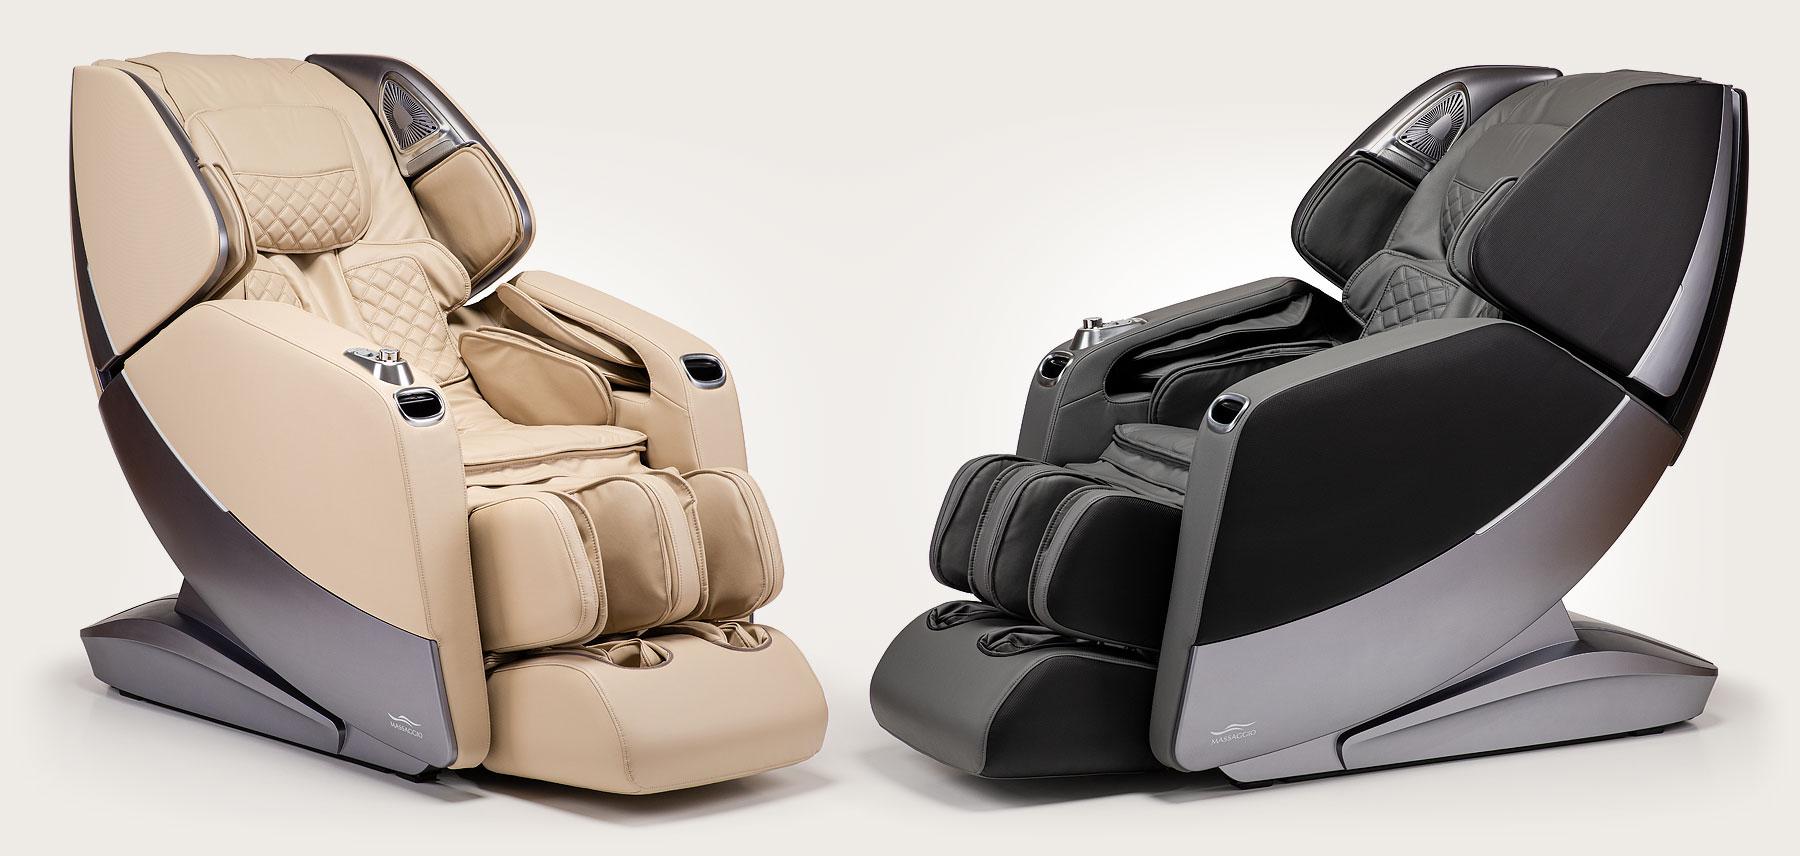 Fotel masujący Massaggio Stravagante 2 - kolory